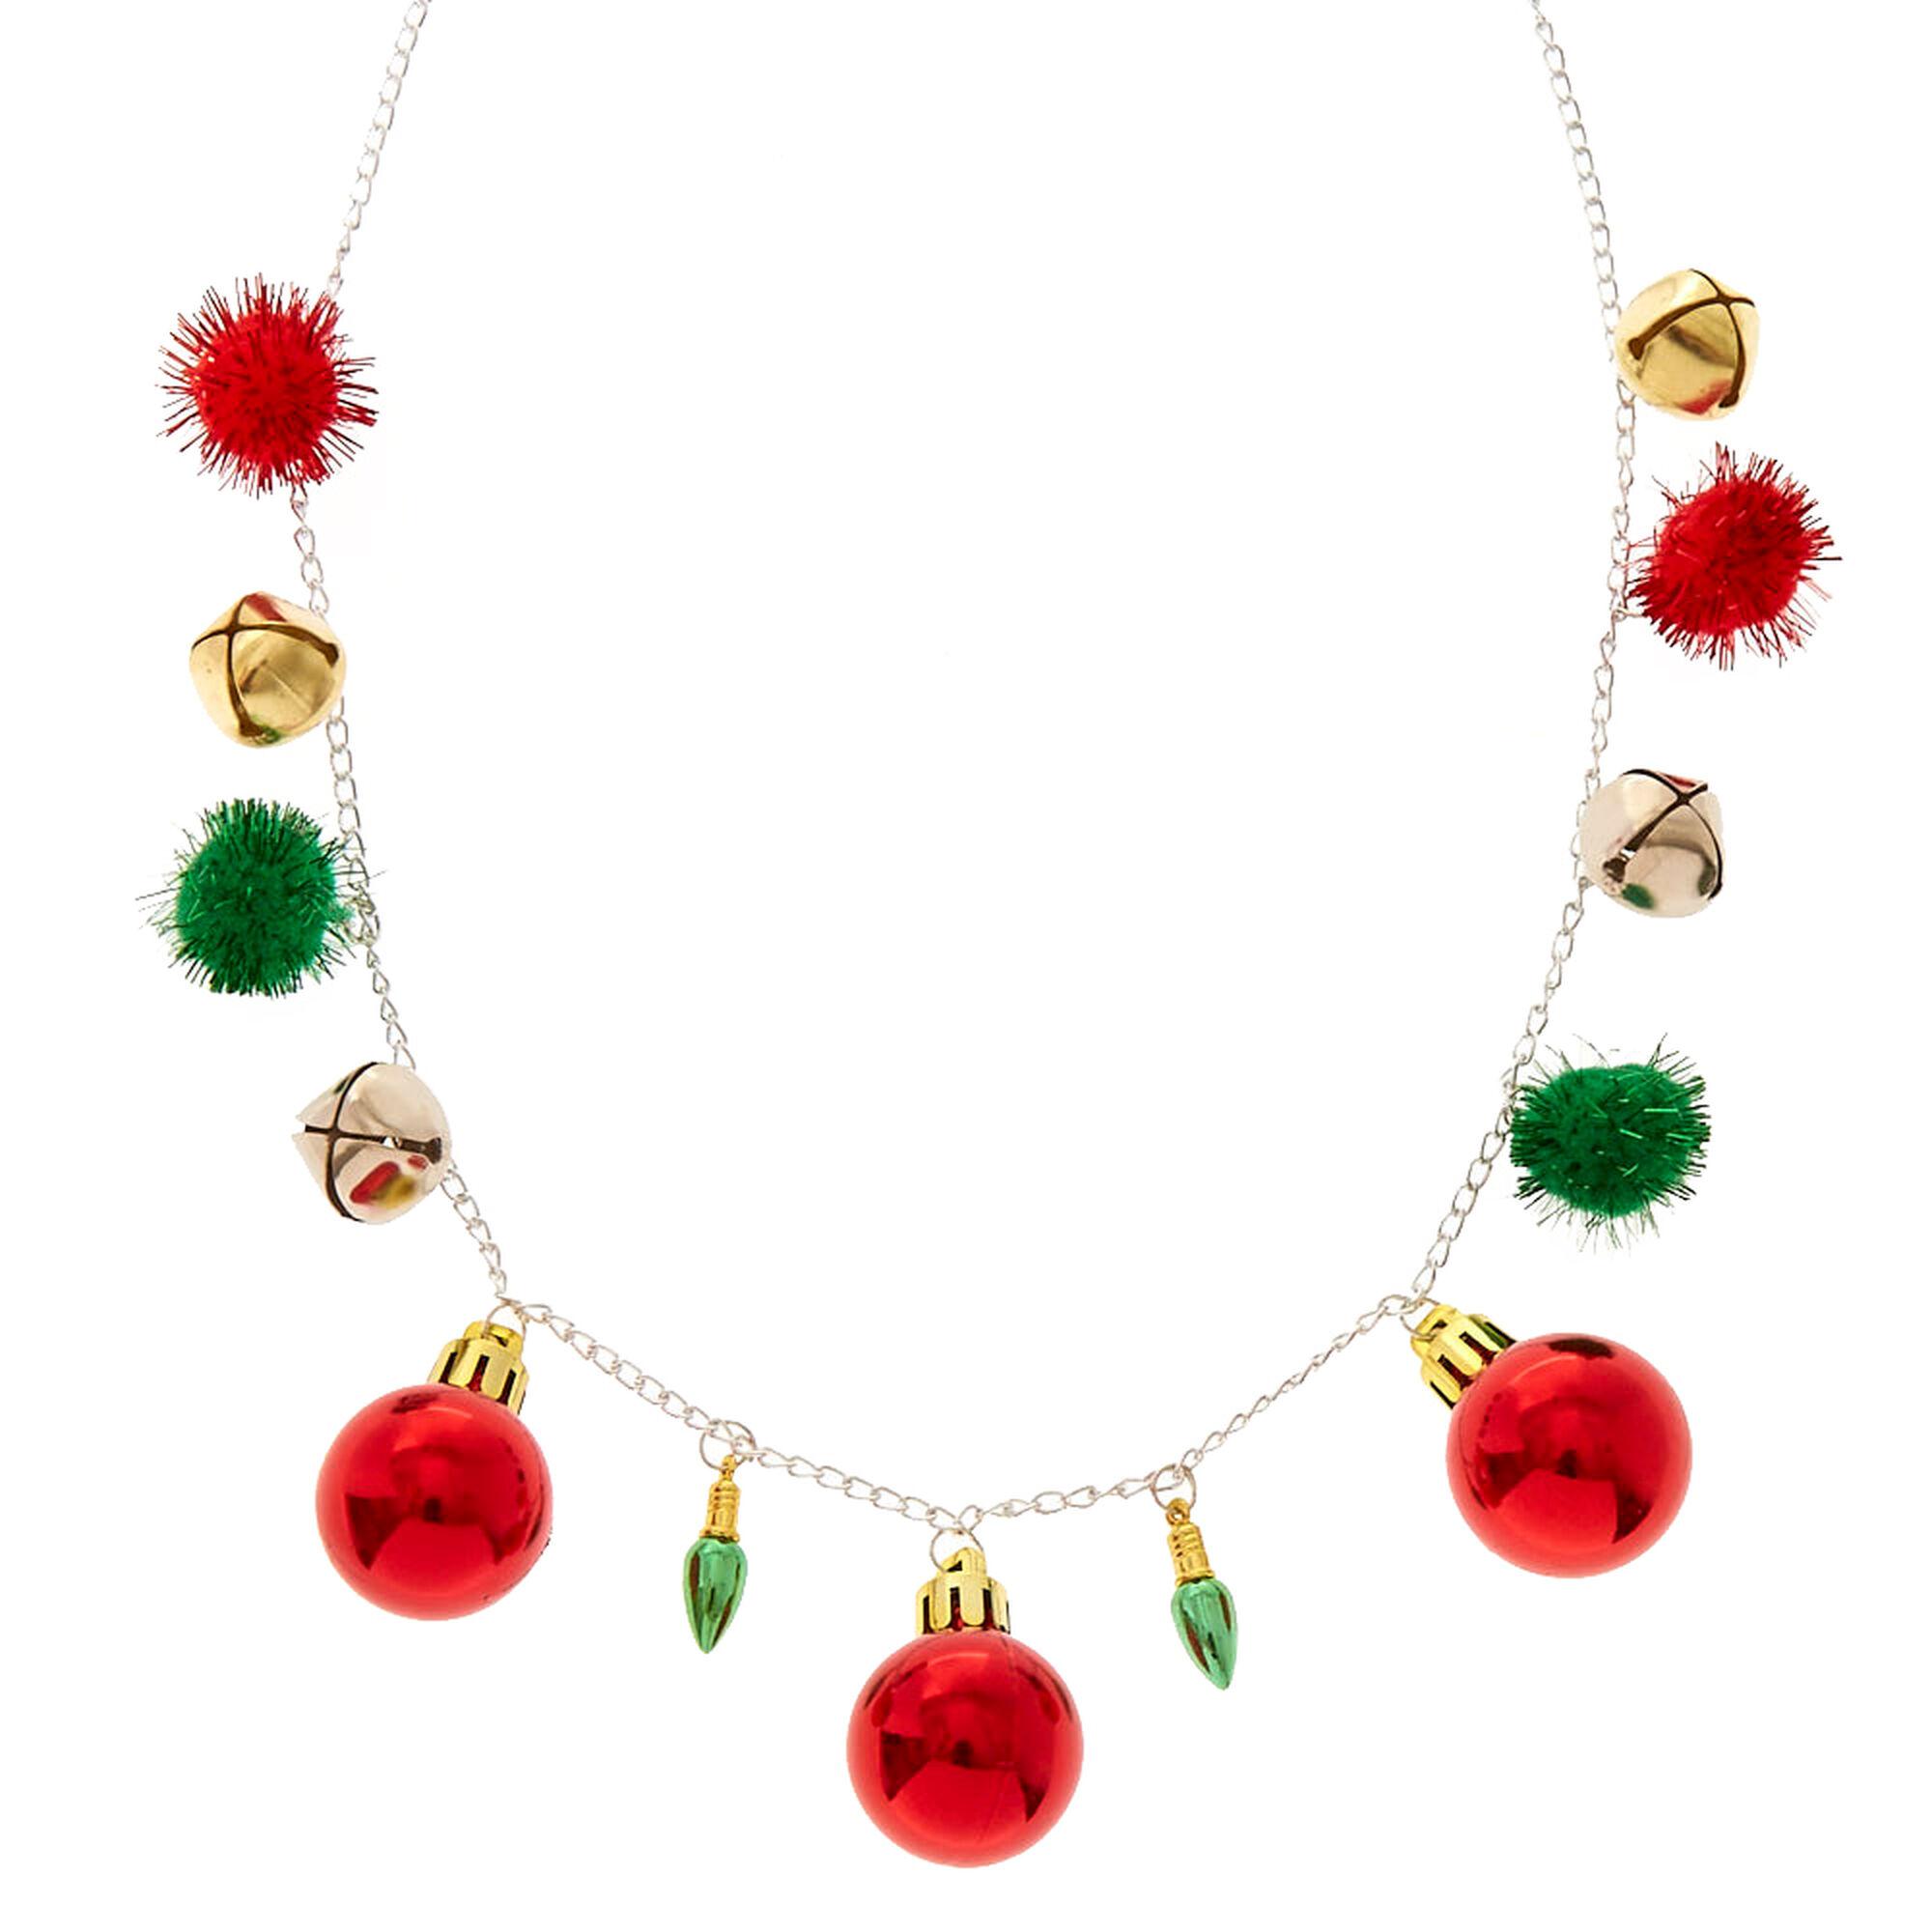 collier noel Collier de Noël extravagant | Claire's FR collier noel